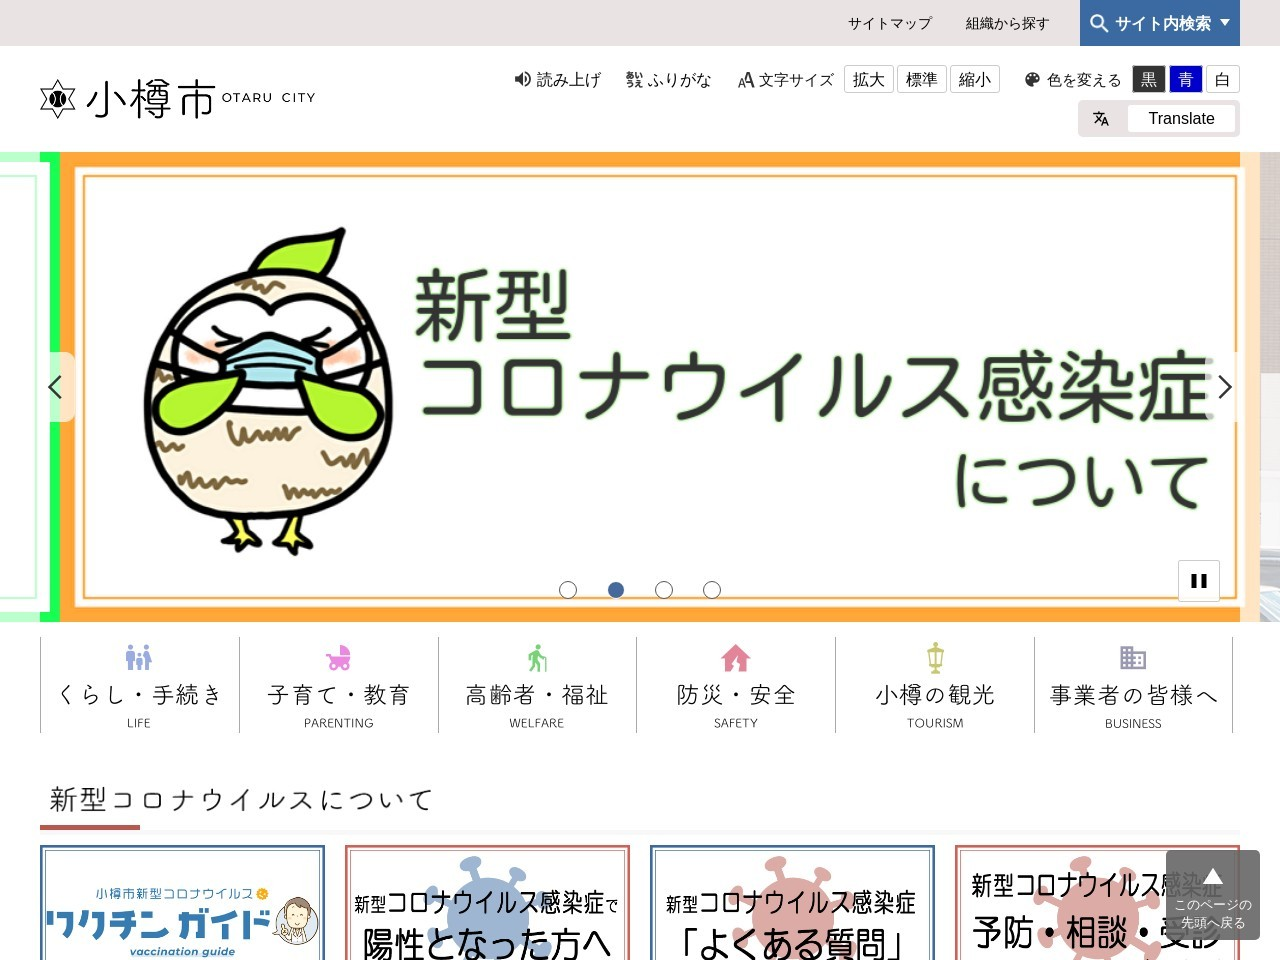 https://www.city.otaru.lg.jp/simin/gakushu_sports/bunkazai_isan/rekisi_bunka_kihonkoso/rekibunbunkaisanforum.html